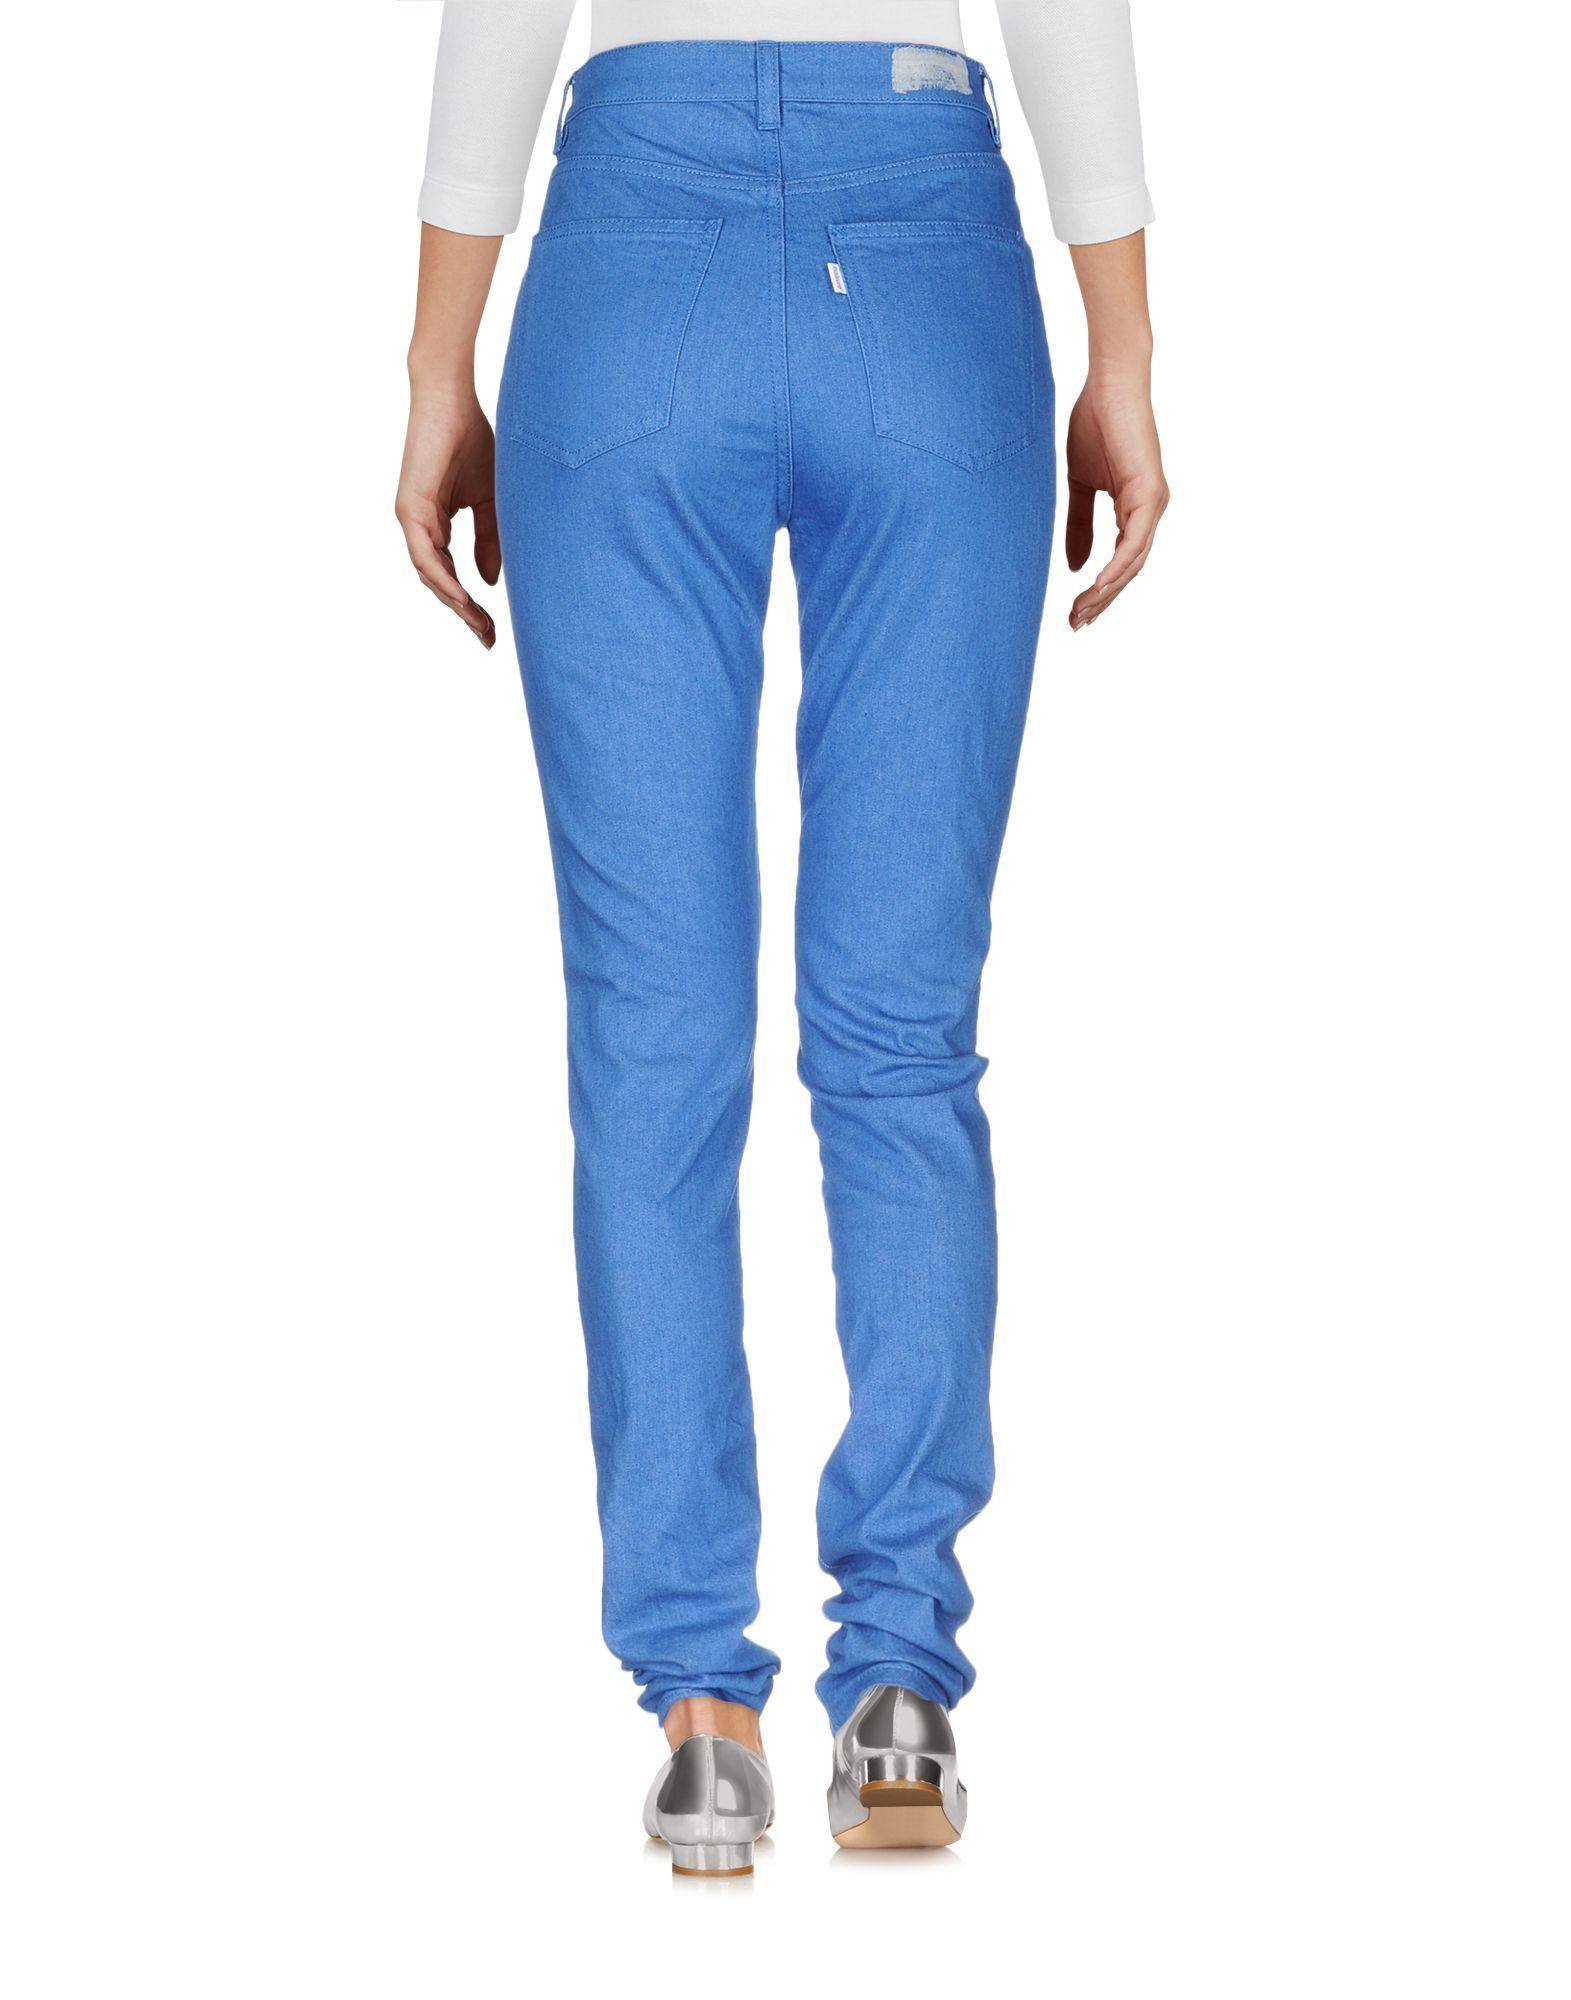 Denim Haikure Dark Blue Women's Cotton